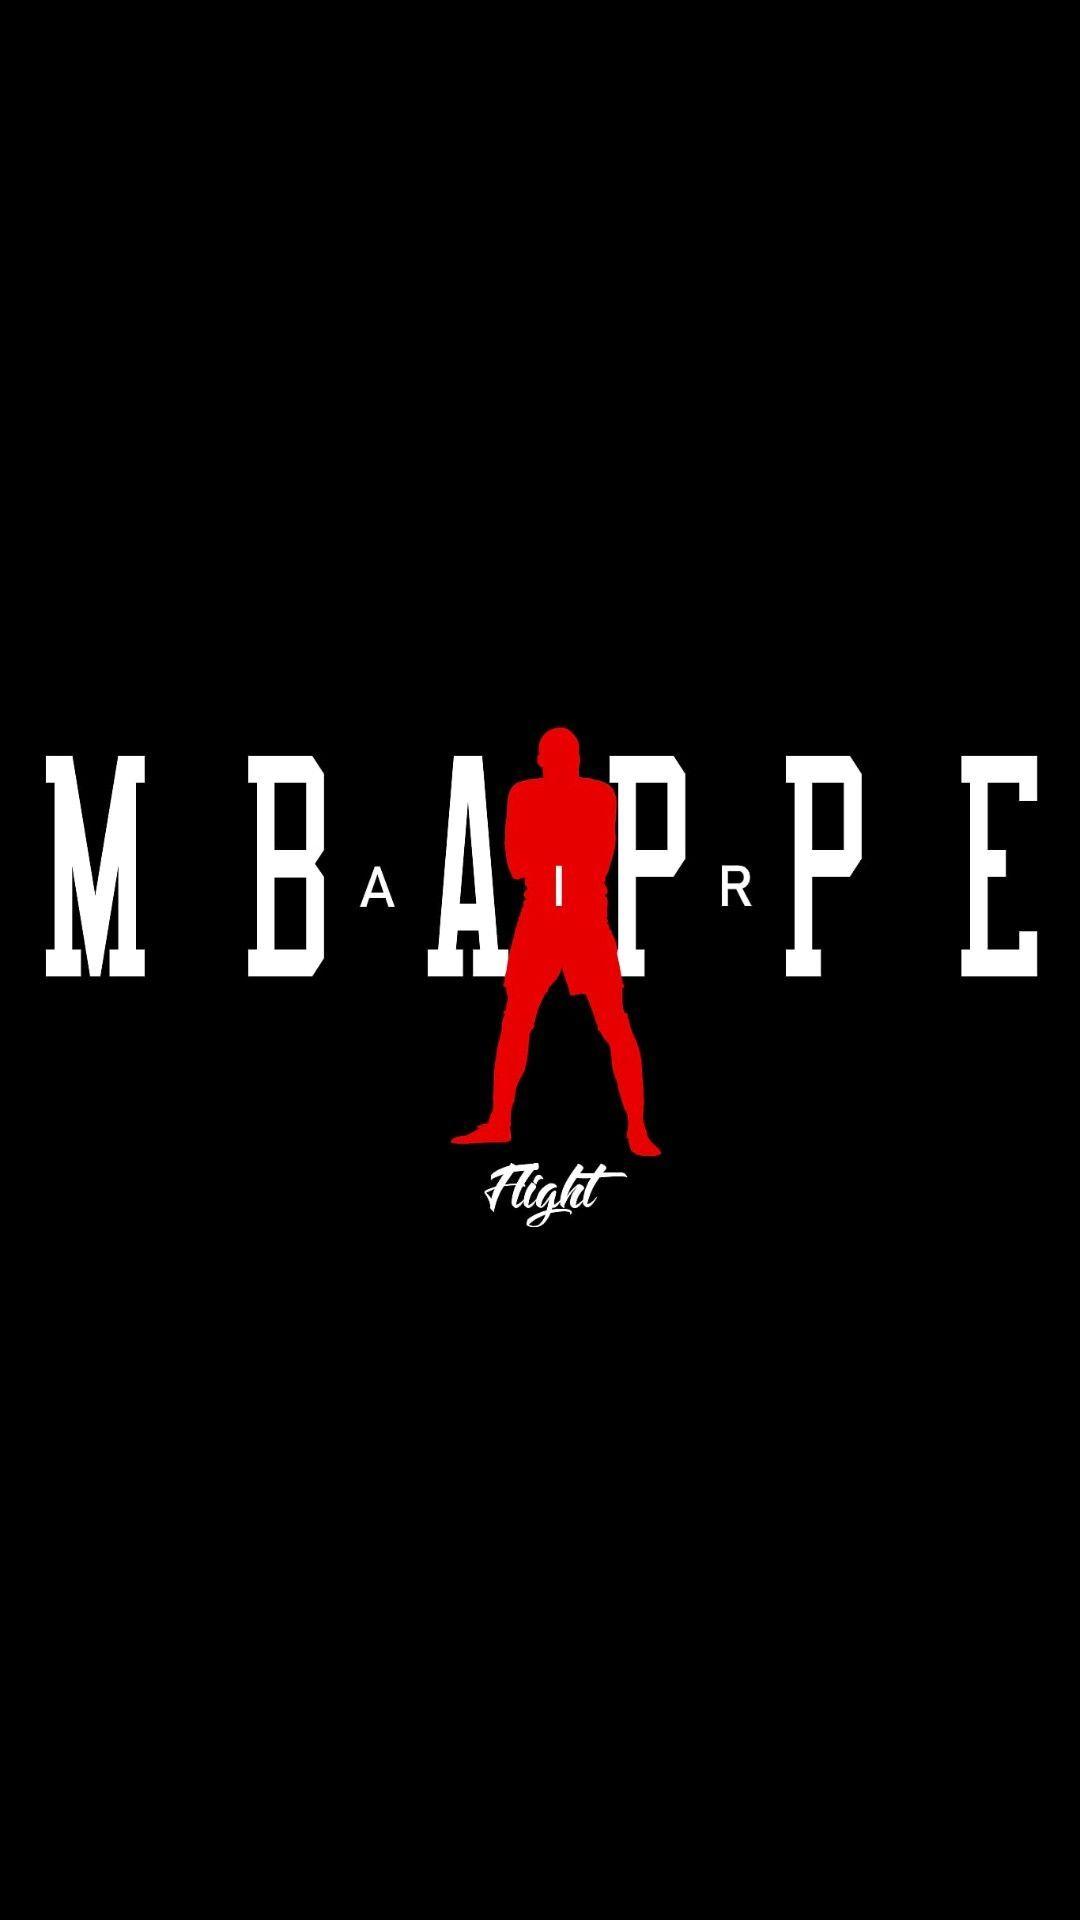 Mbappe X Air Jordan Fond D Ecran Psg Joueur De Football Psg